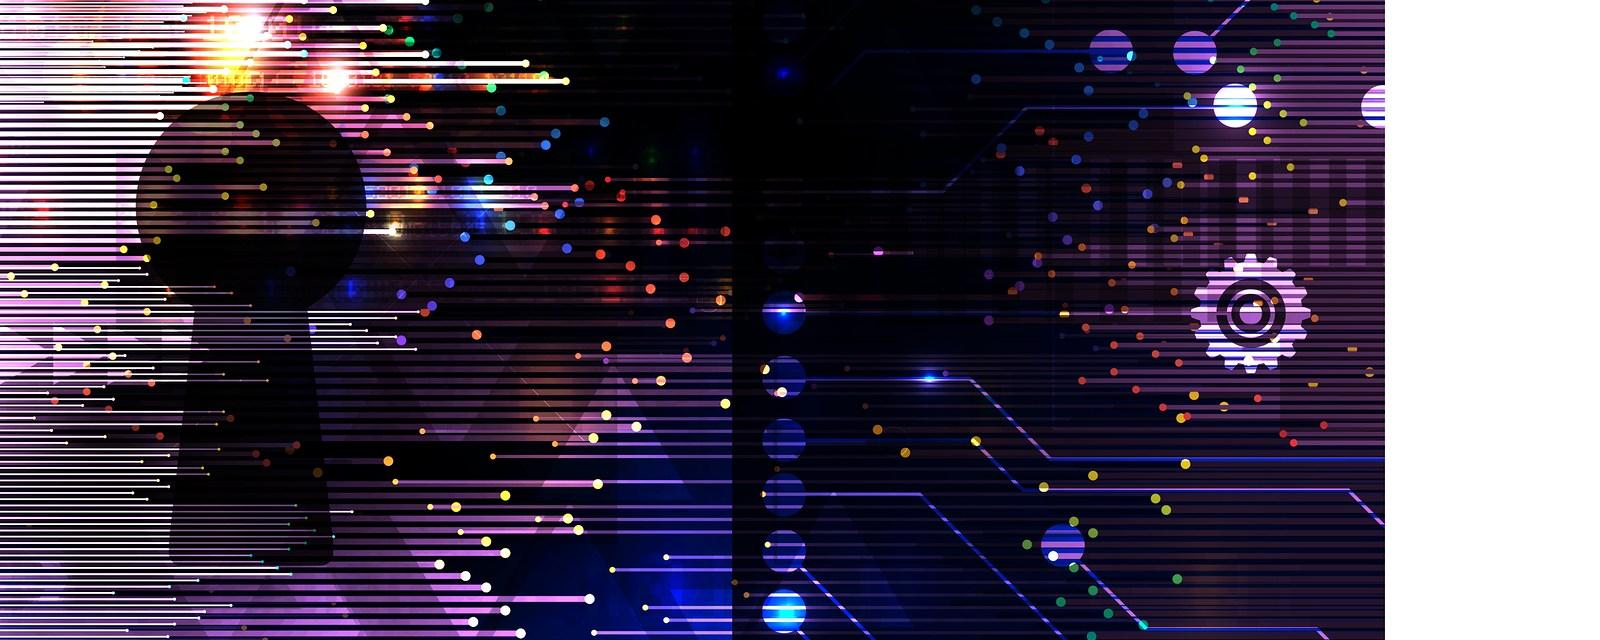 Open source Incident Response Tools